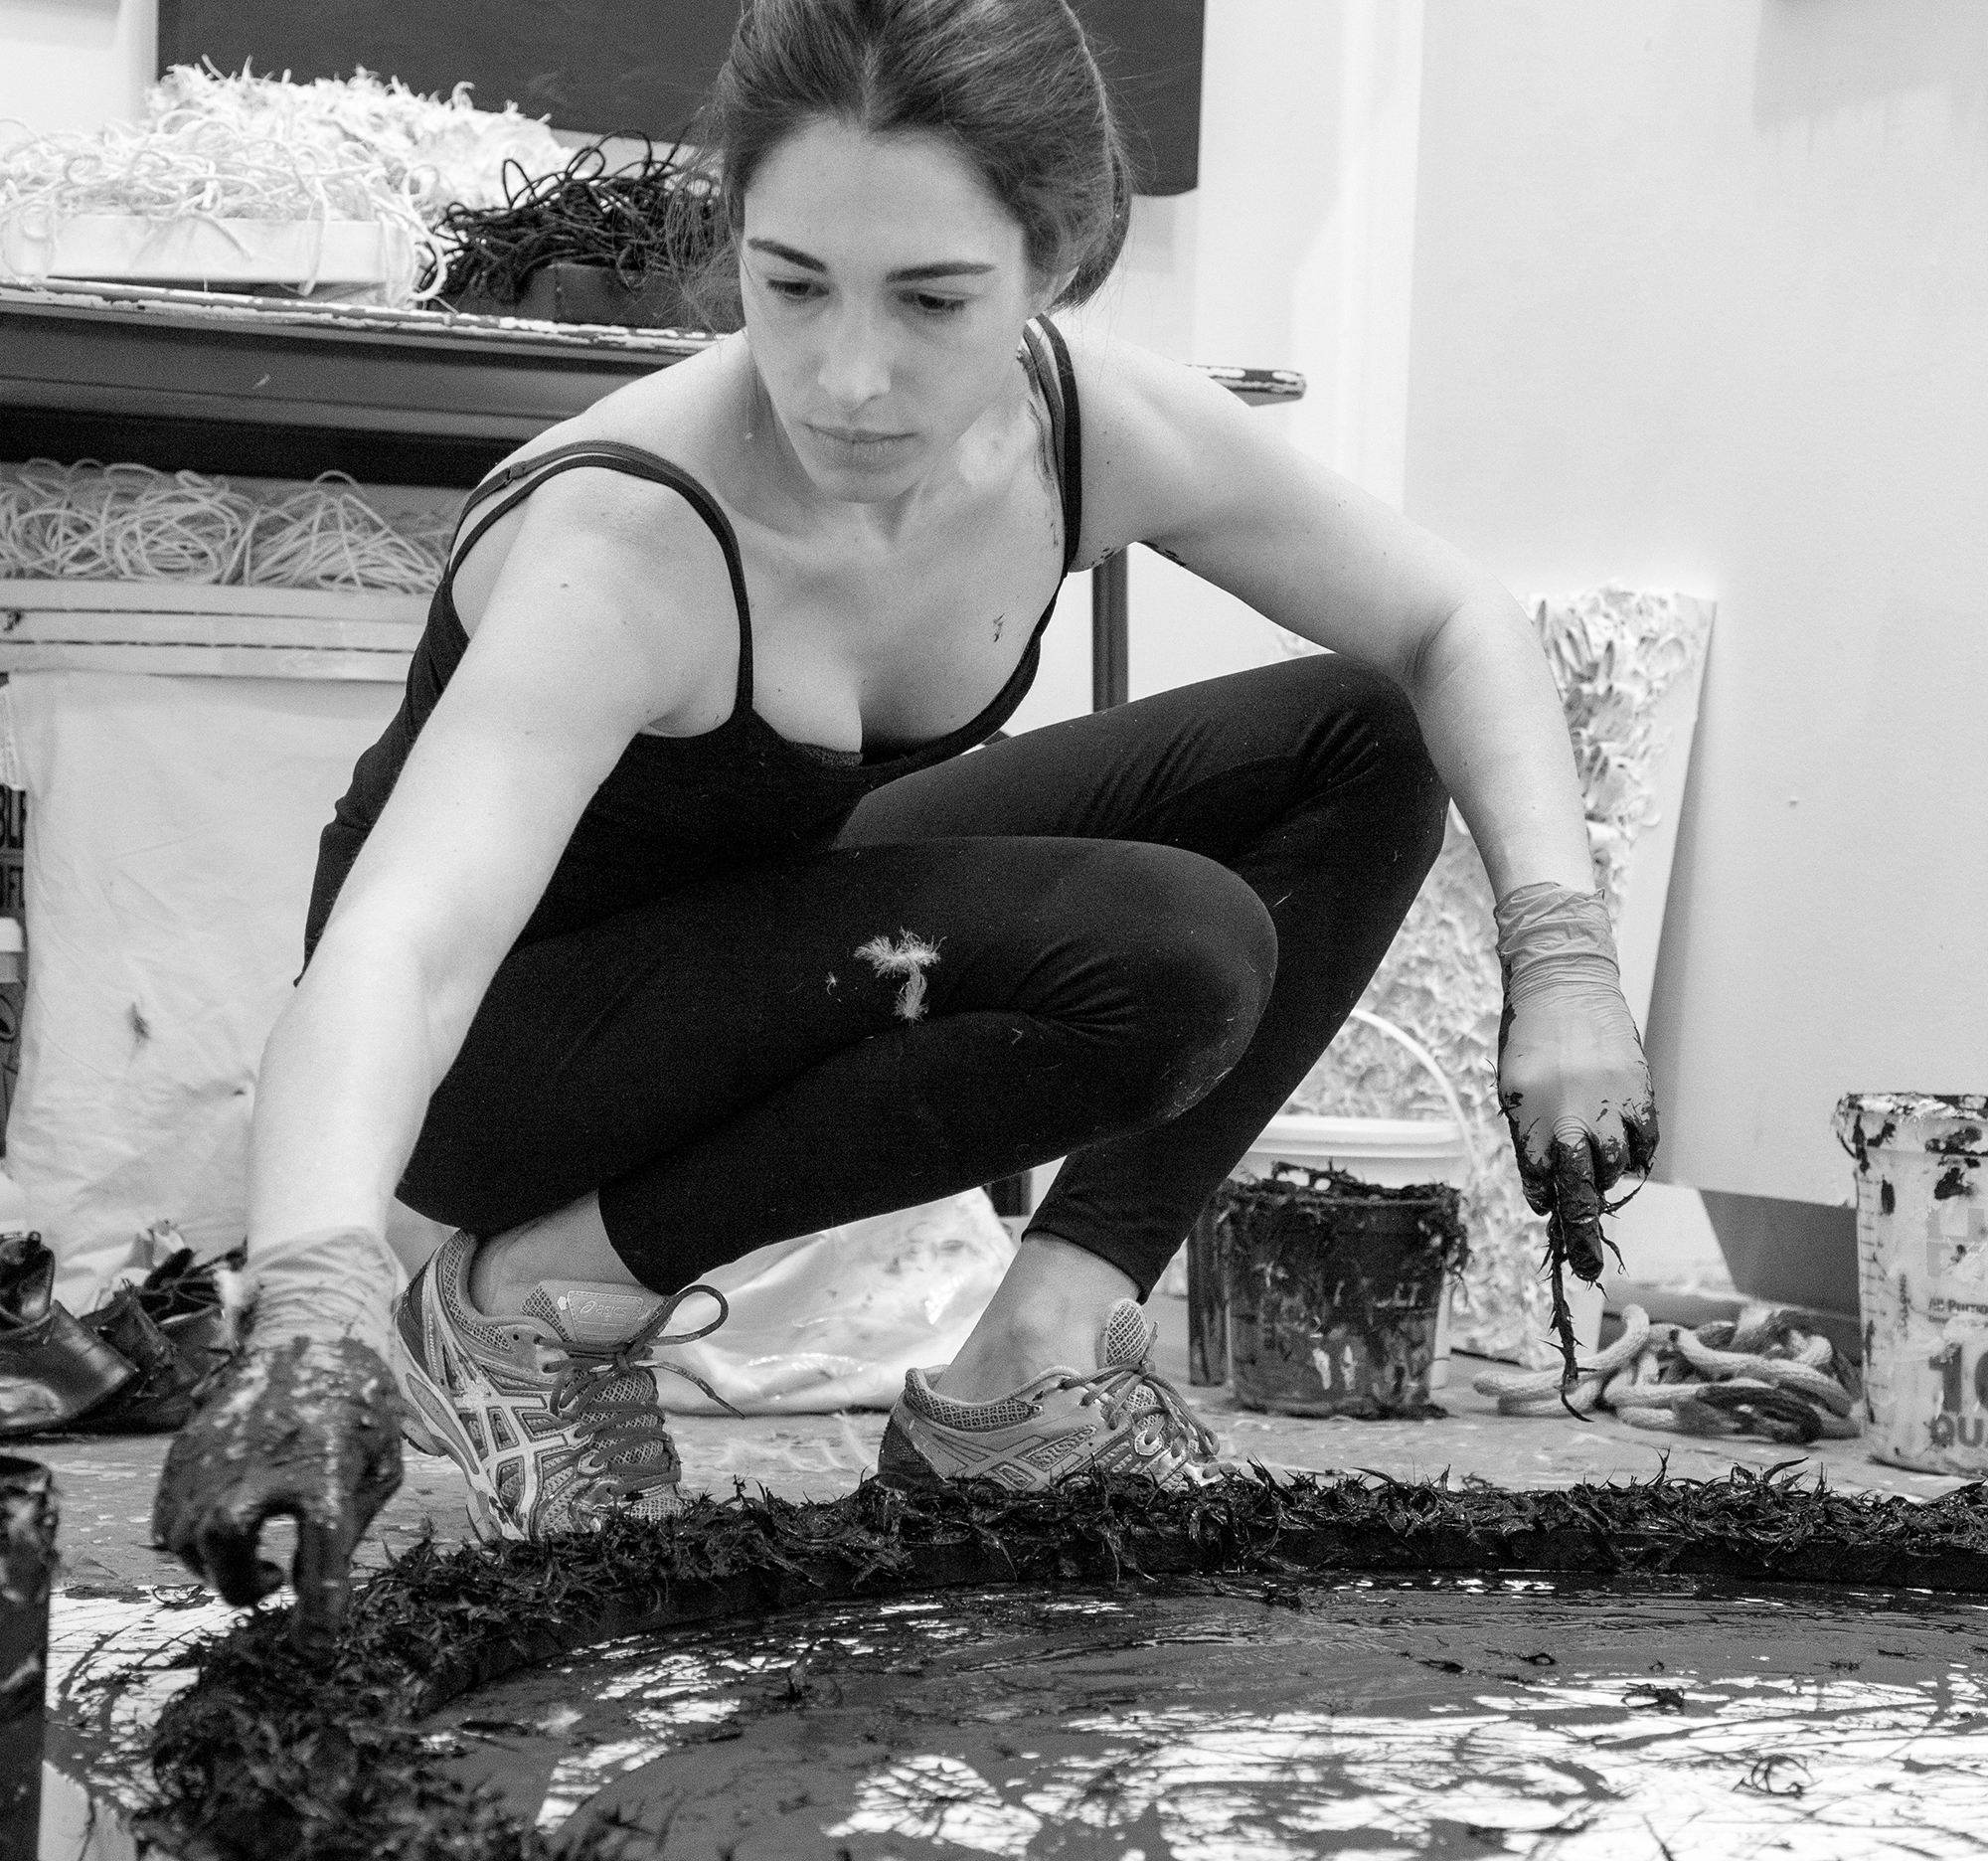 Maria Fragoudaki / Artist